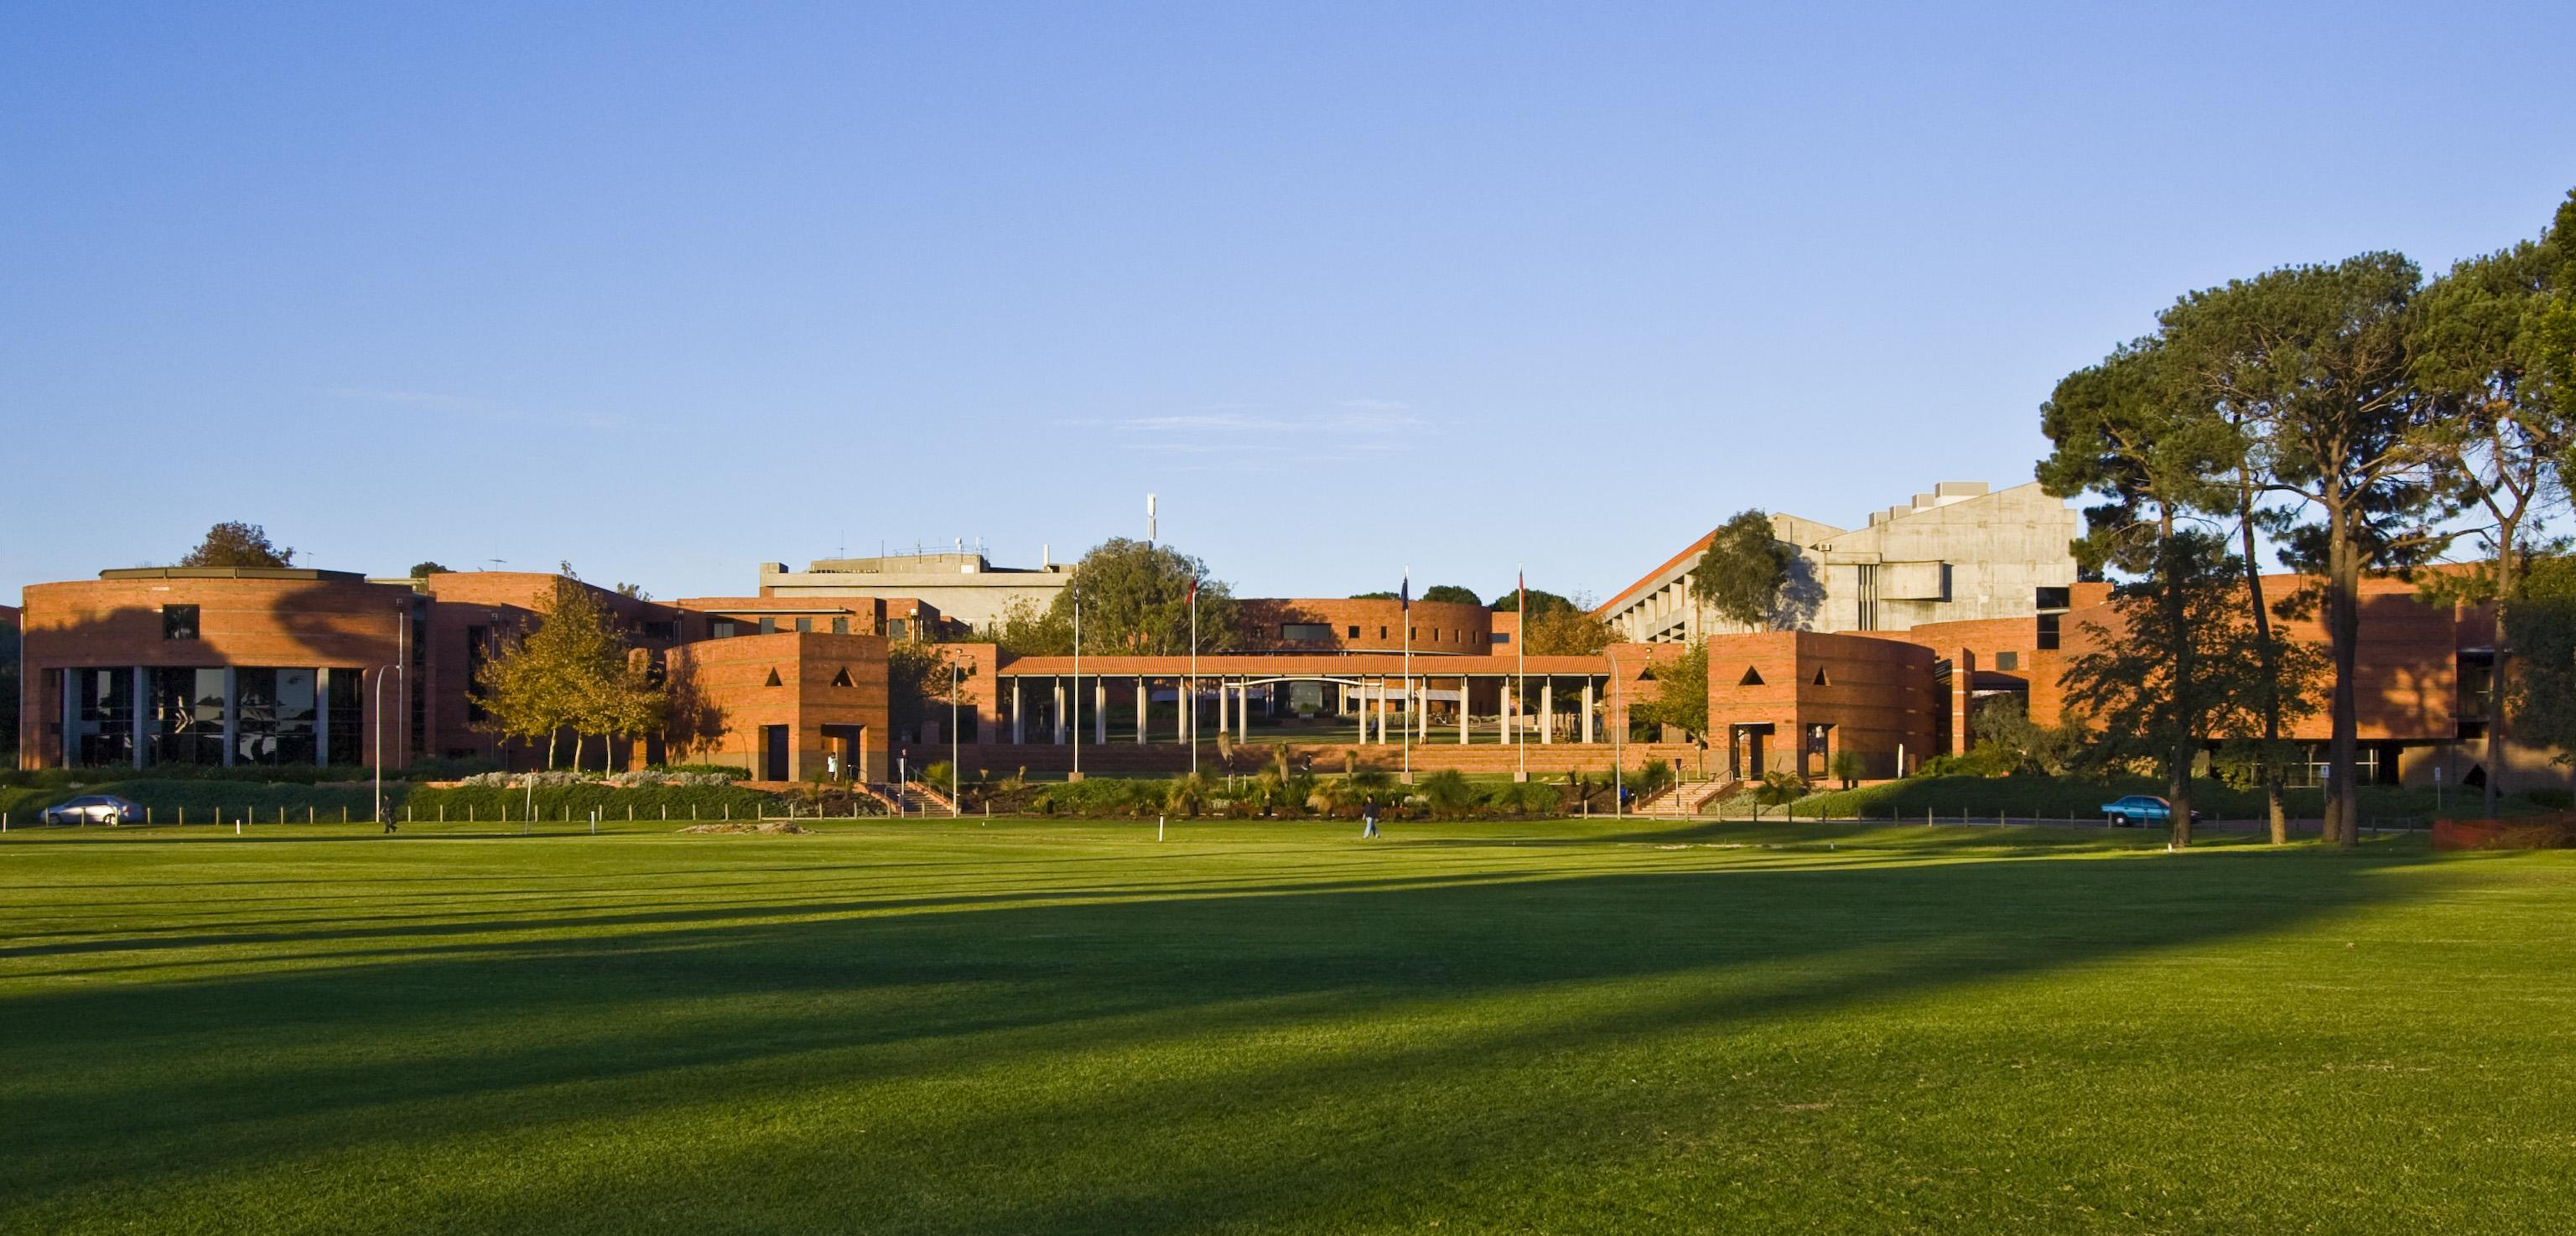 Curtin University buildings